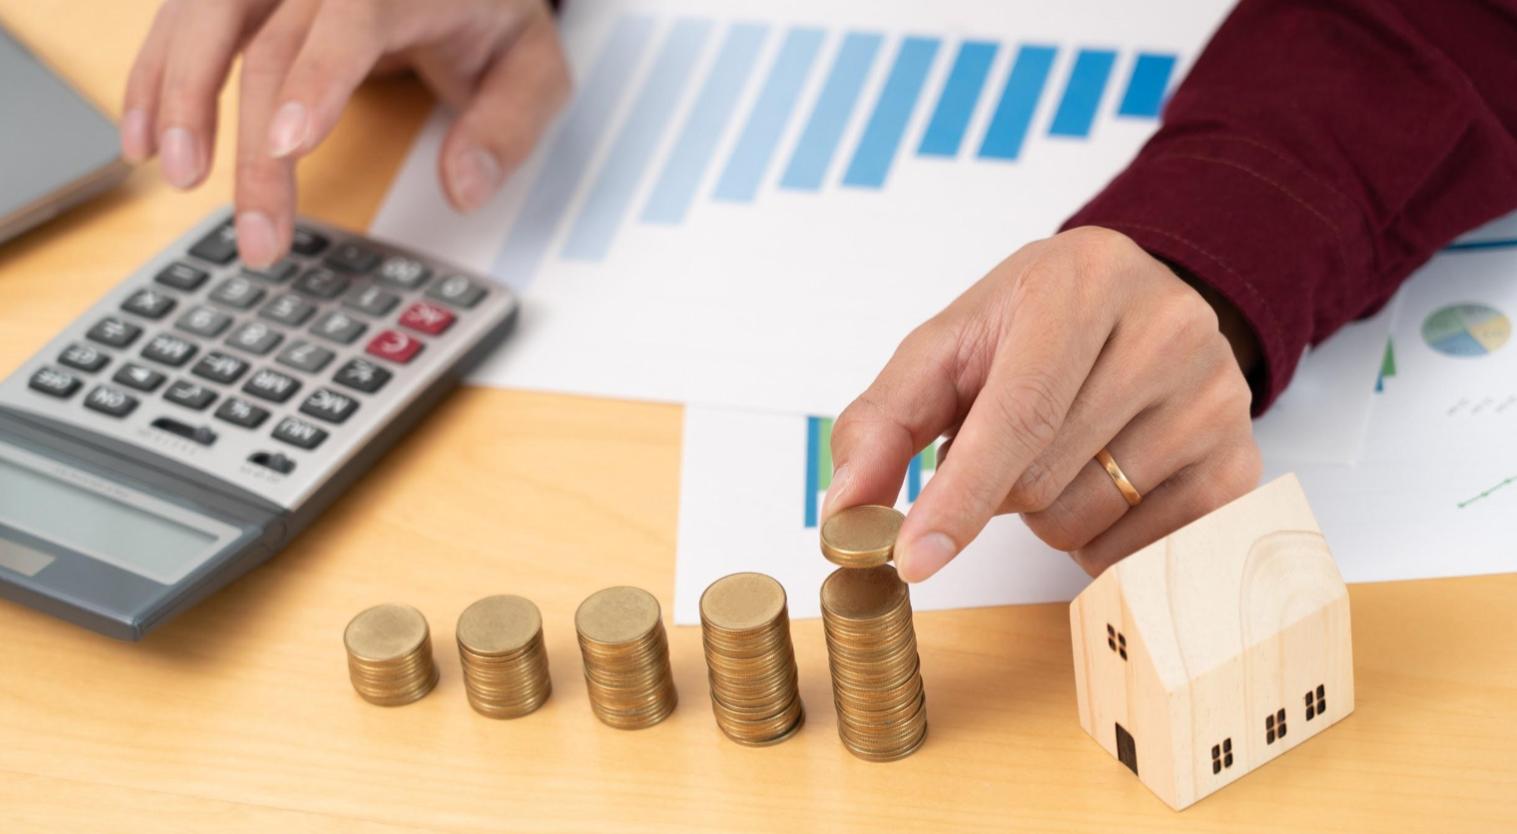 Errores comunes antes de firmar la hipoteca